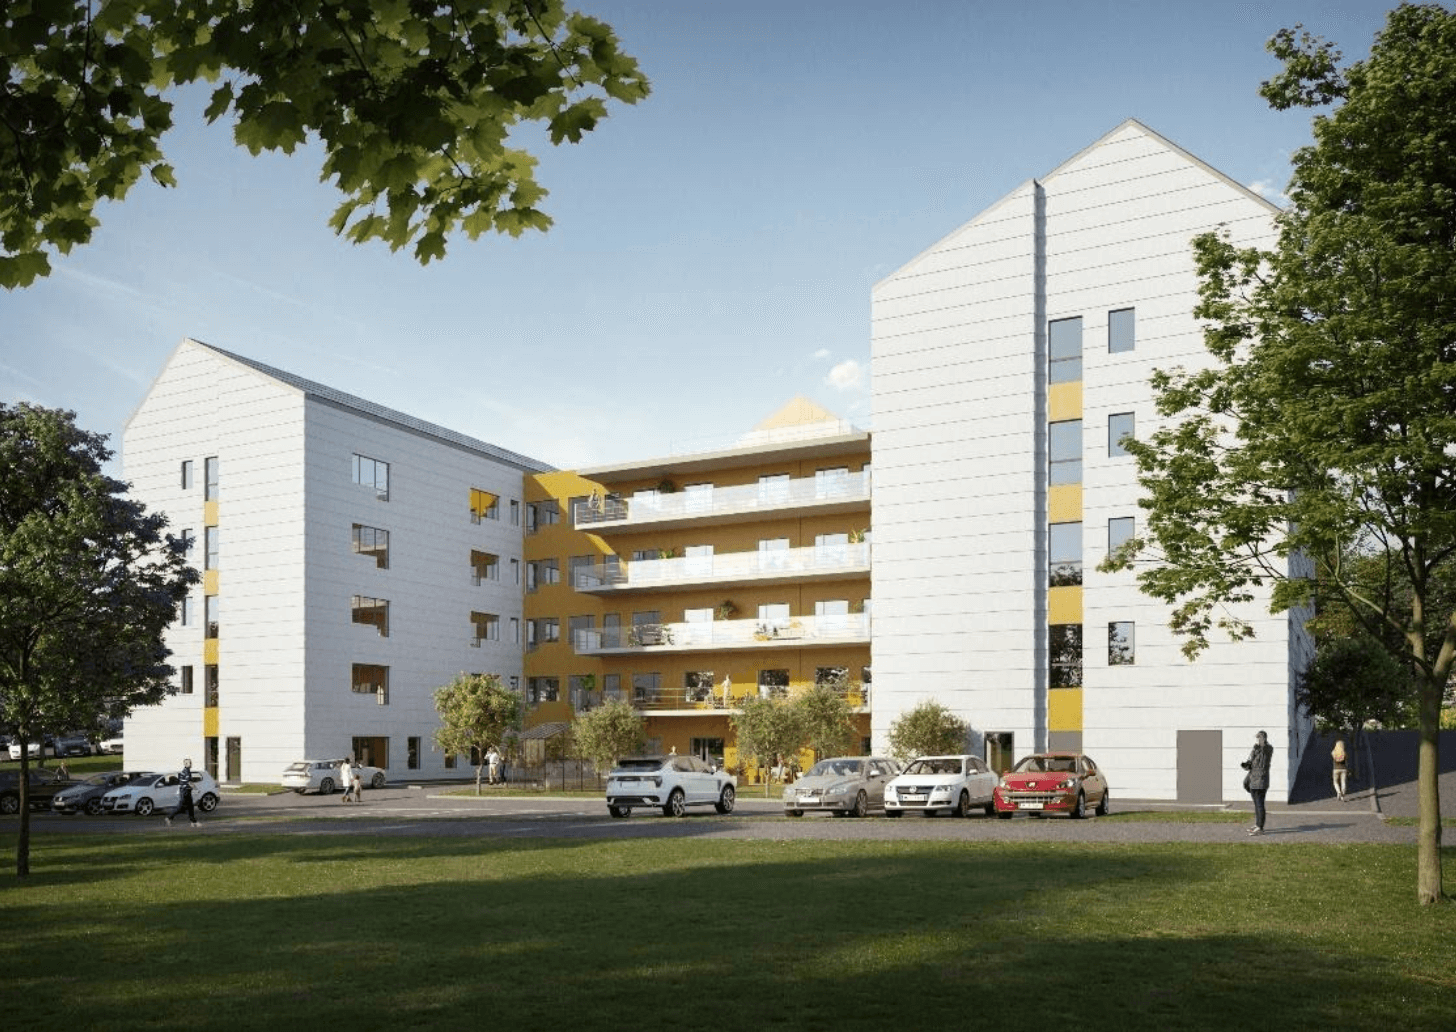 Slik benyttet Skanska Bimeye i prosjekt: Villa Brogården